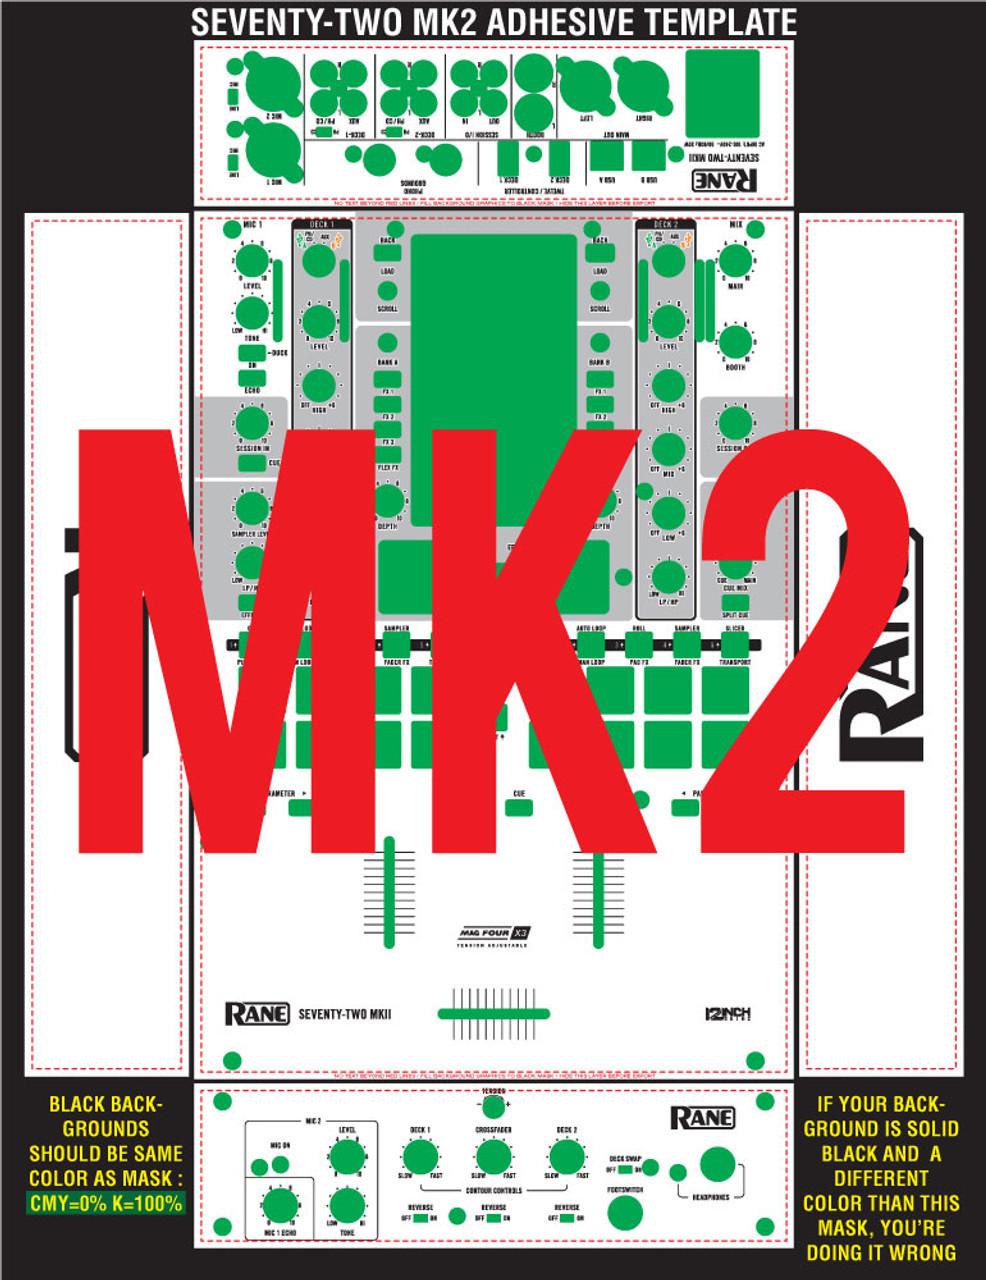 Rane  Seventy-Two MK2 Skinz Custom - ADHESIVE